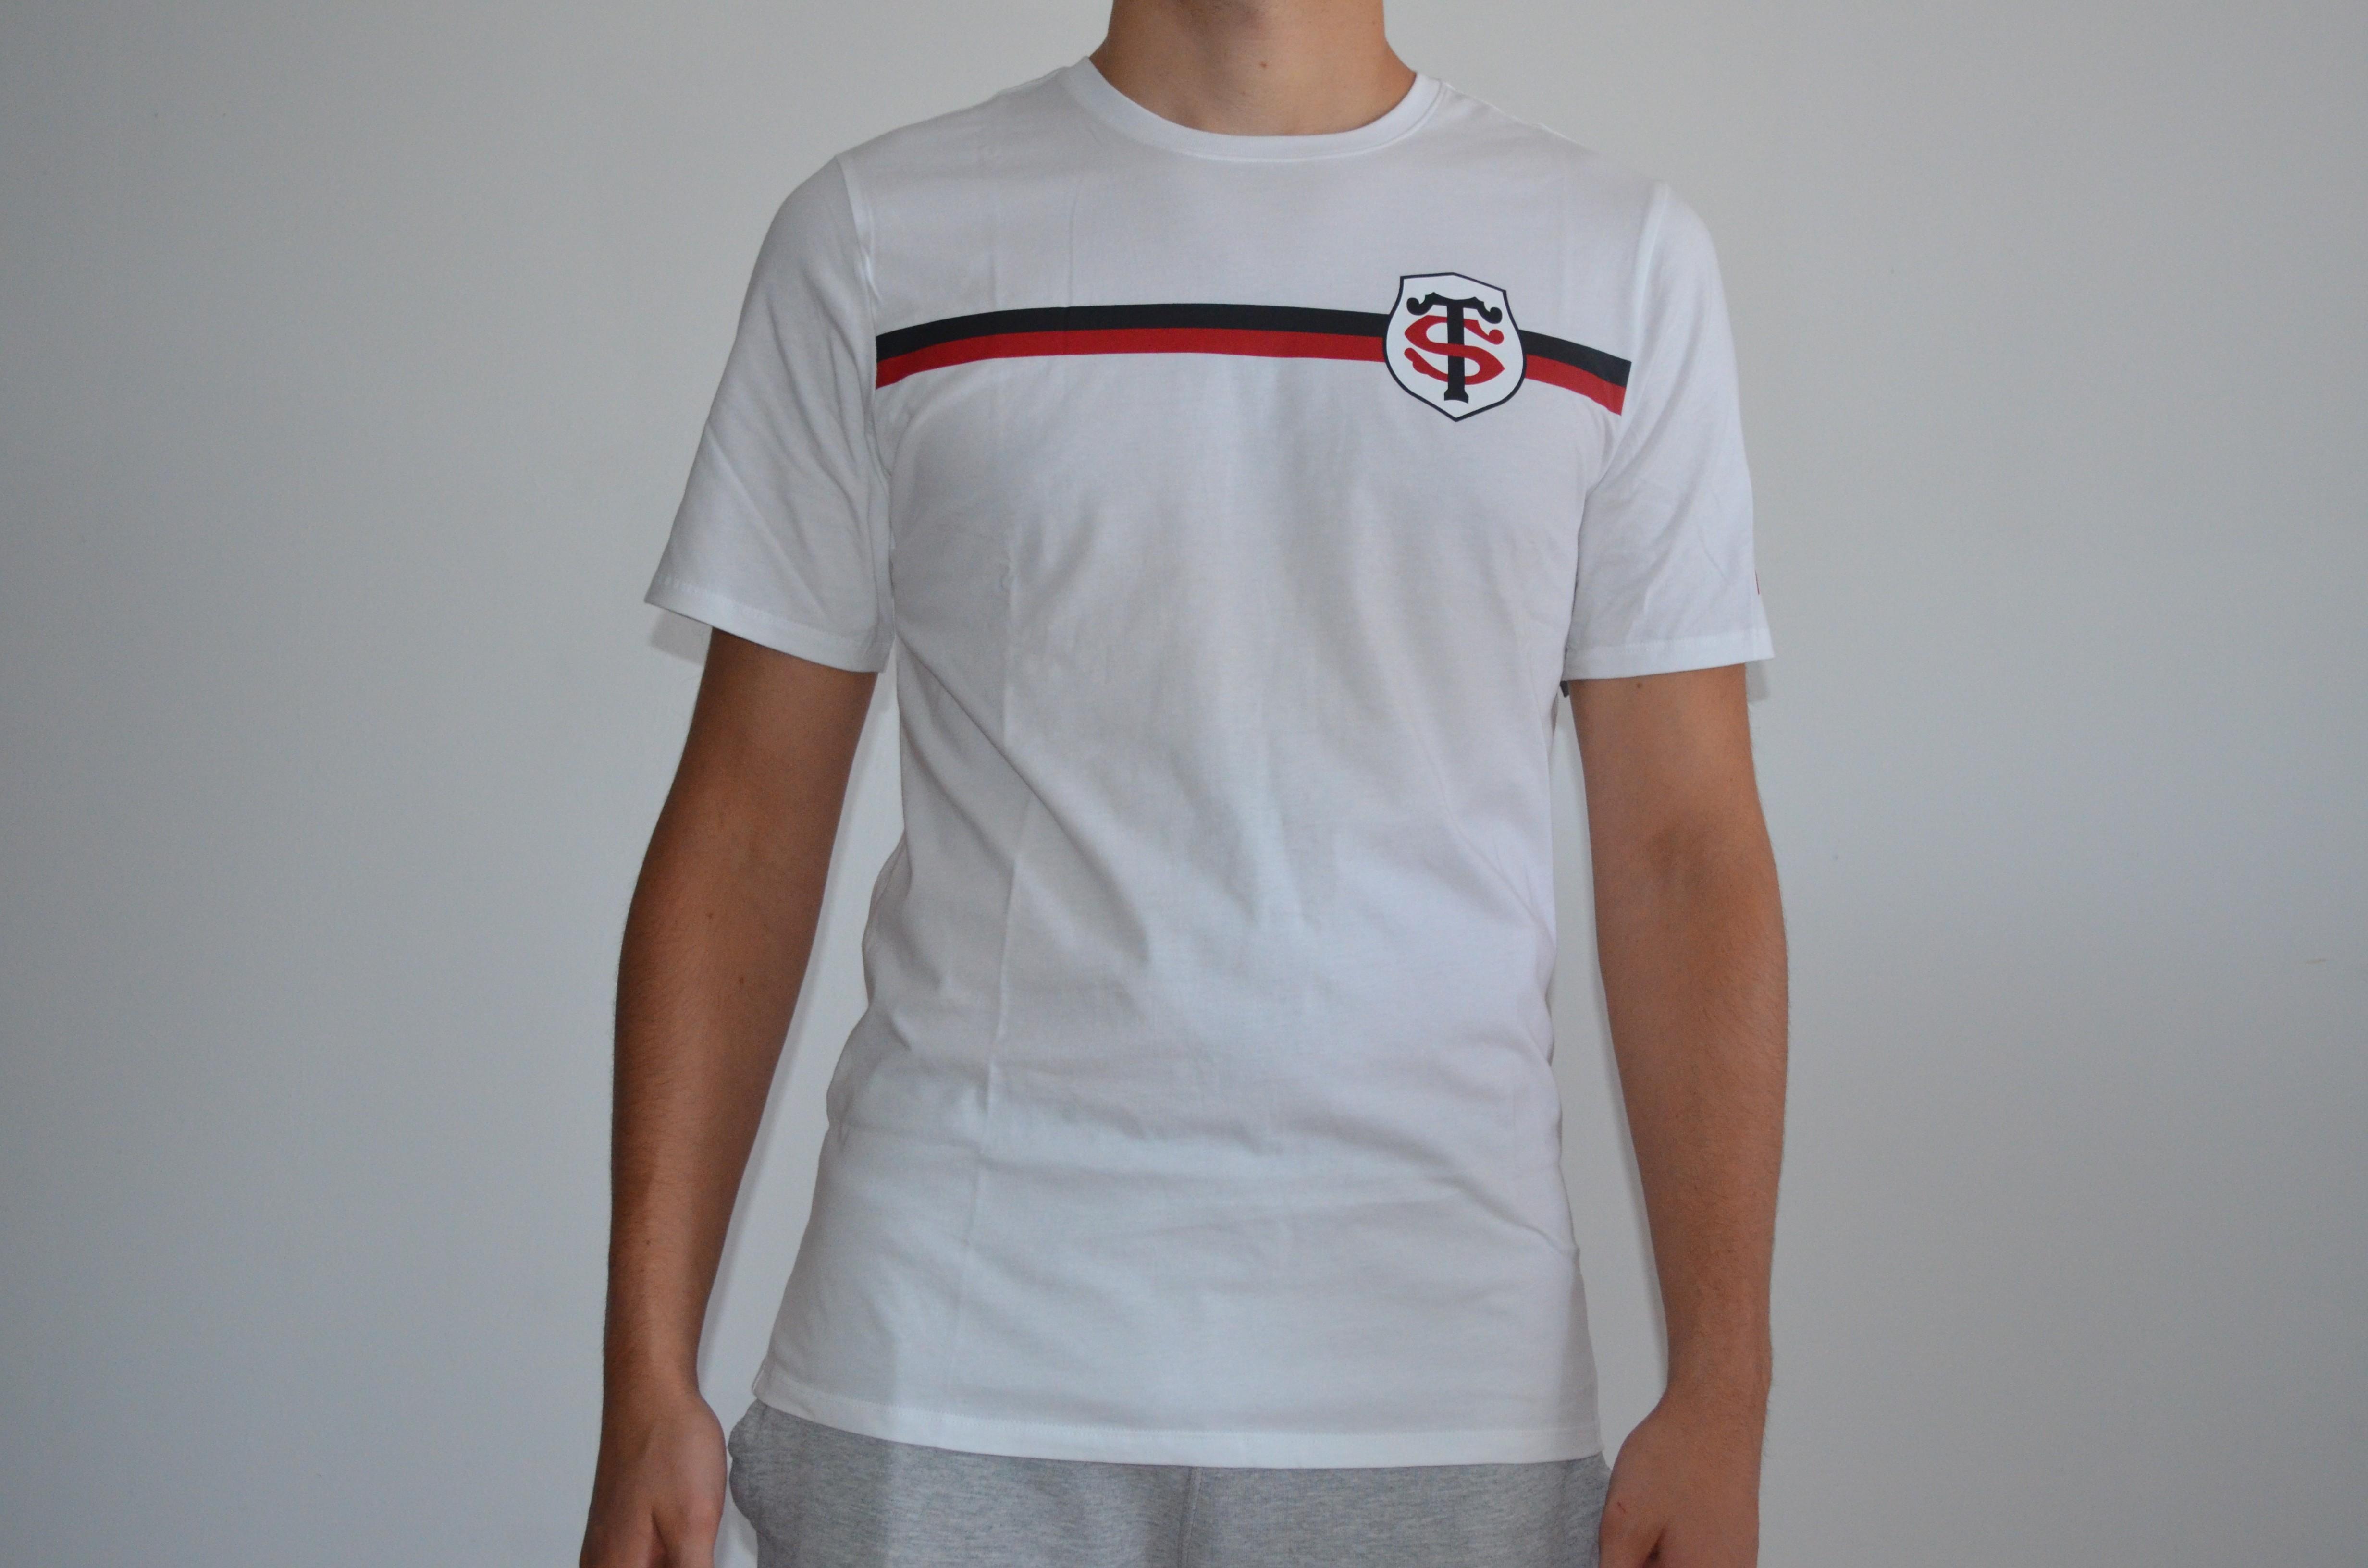 Tee shirt Nike Stade Toulousain au meilleur prix   Rugby Player